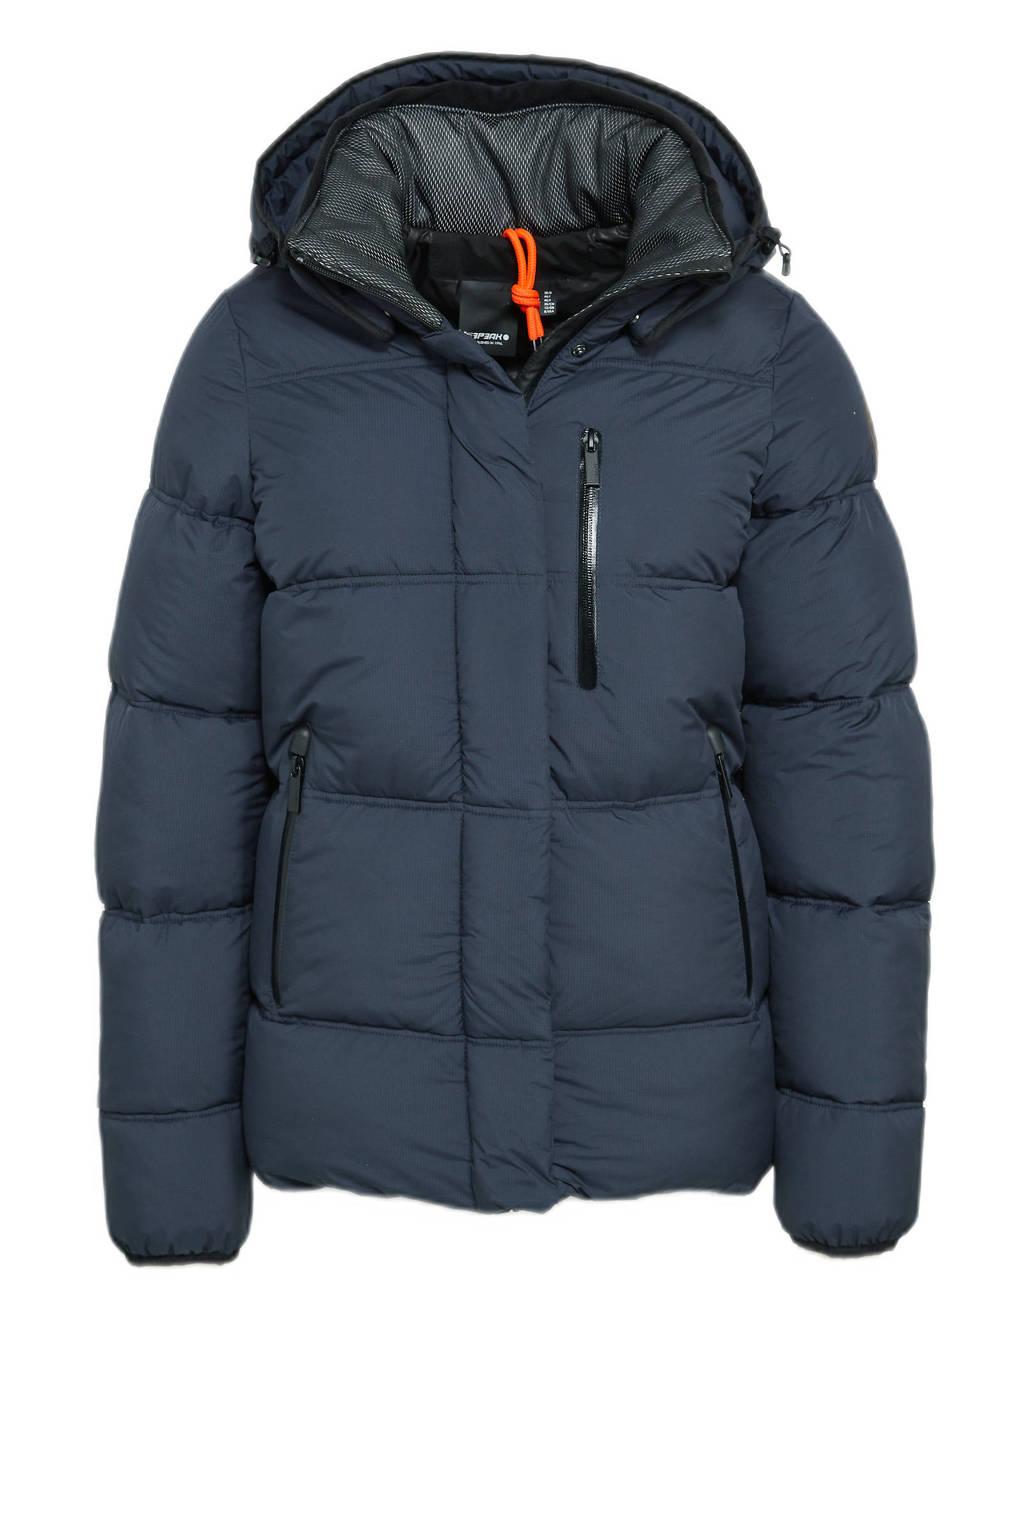 Icepeak outdoor jas Britton donkerblauw, Donkerblauw